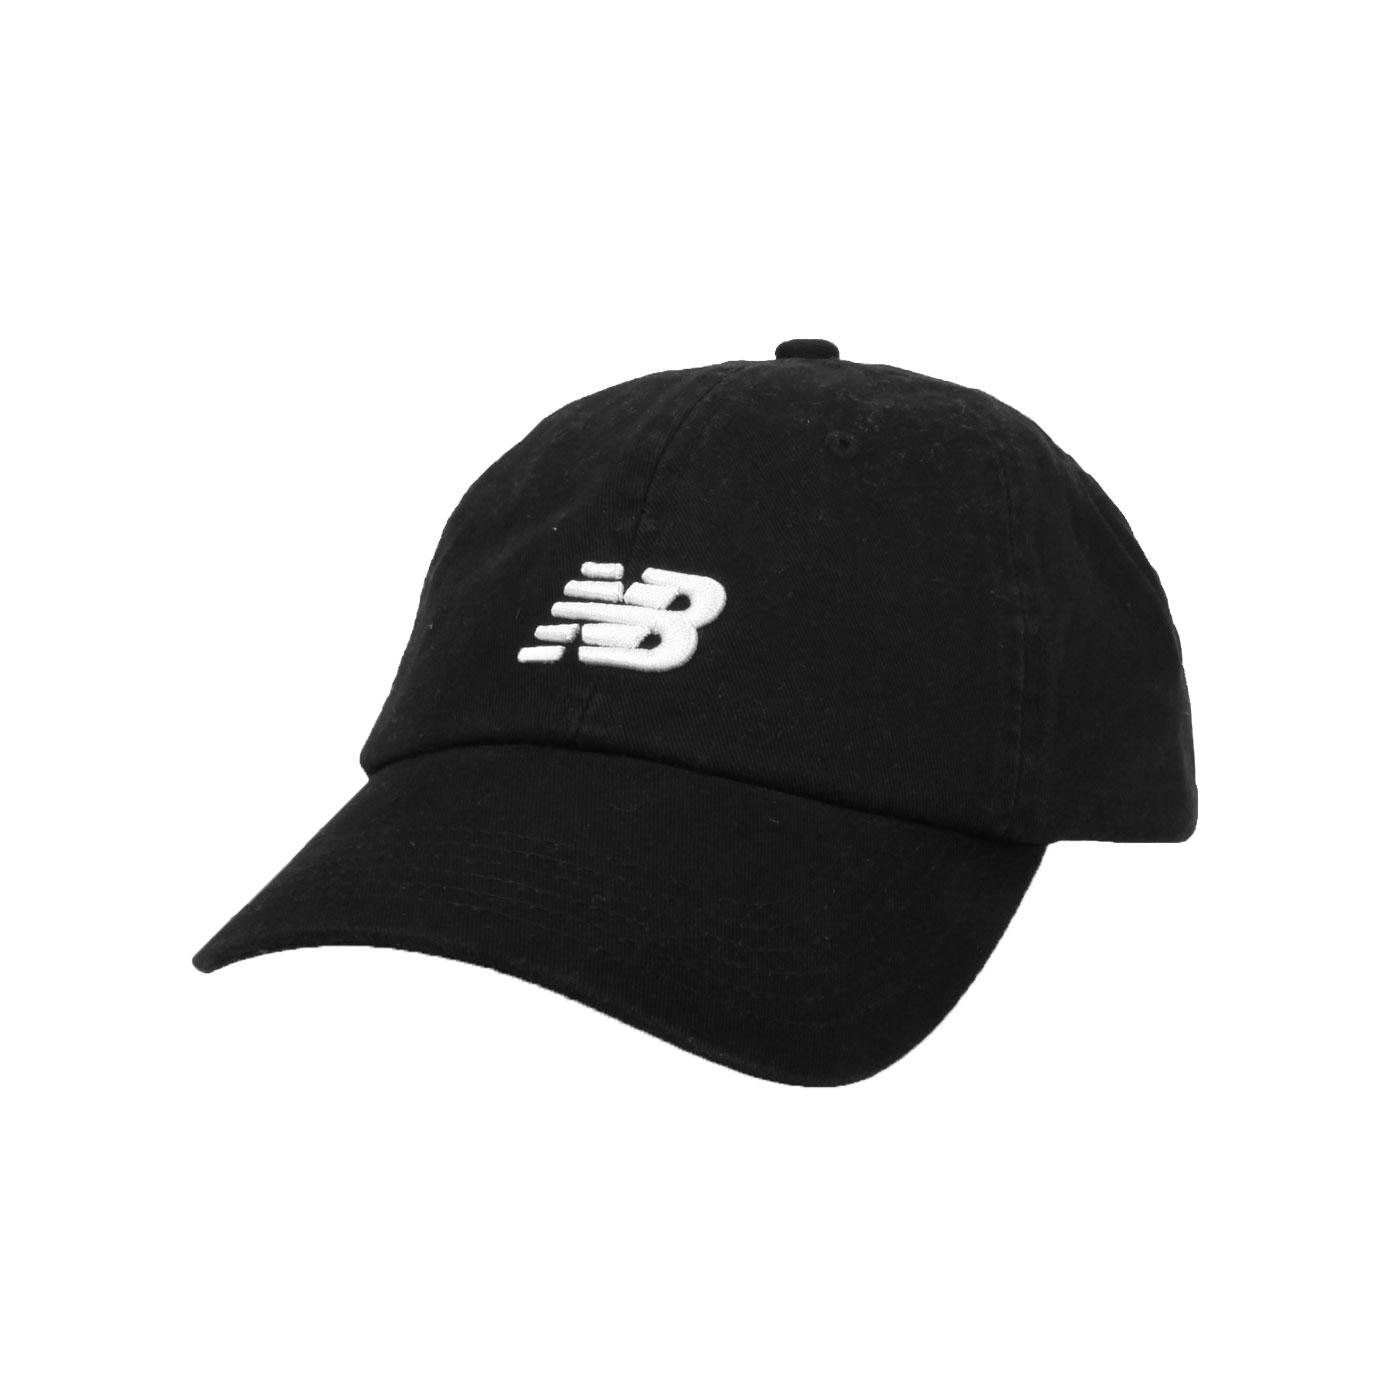 NEW BALANCE 棒球帽 LAH91014BK - 黑白